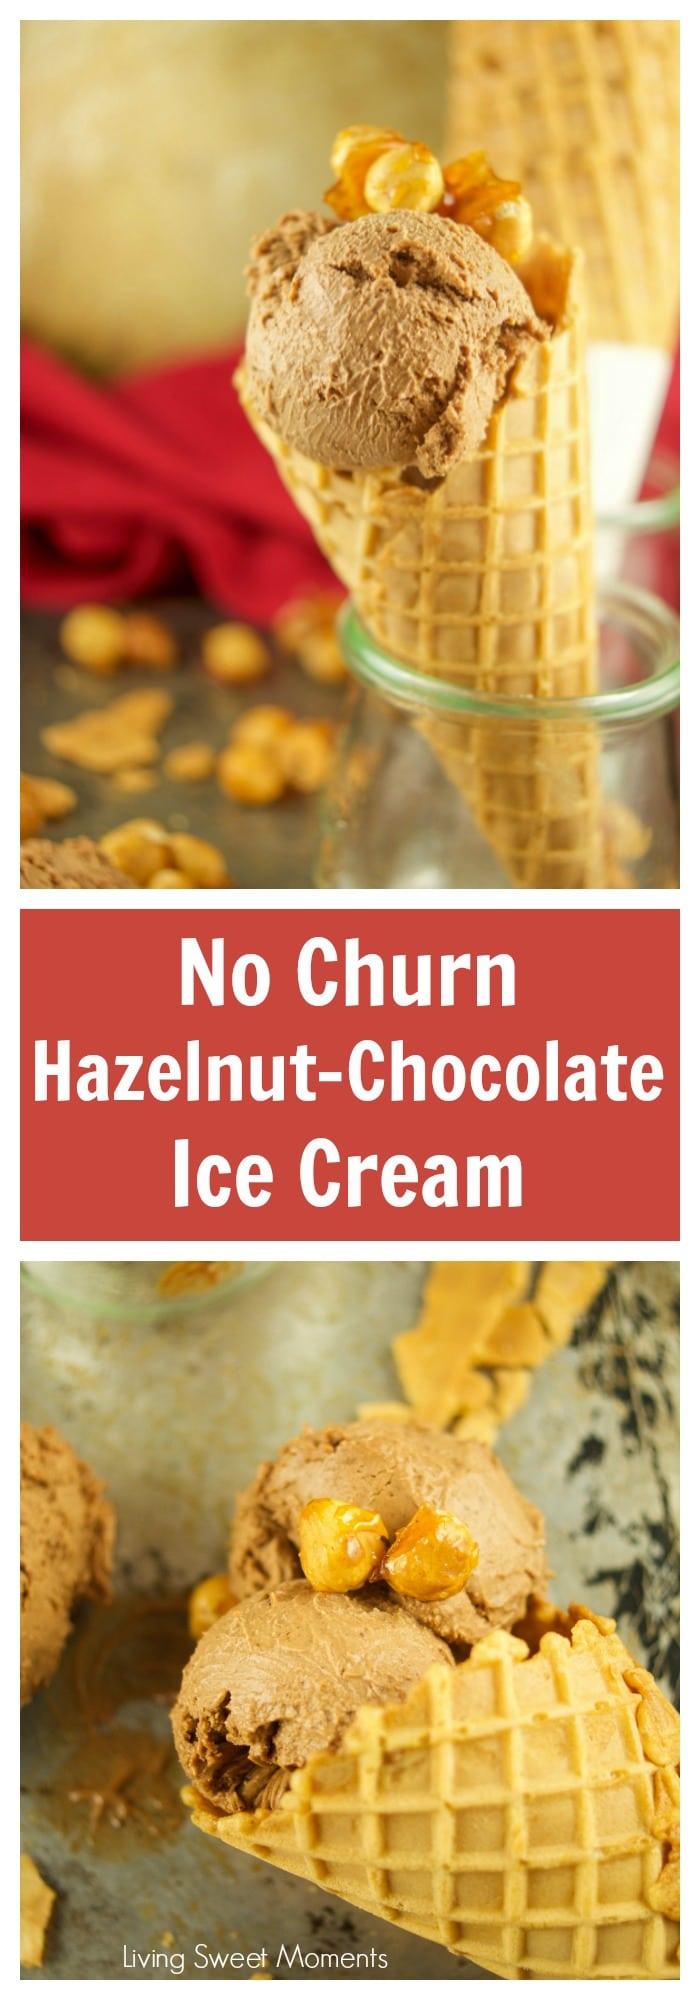 This easy Hazelnut Chocolate Ice Cream Recipe (gianduia) does not require an ice cream machine. It is made with hazelnut praline and bittersweet chocolate.